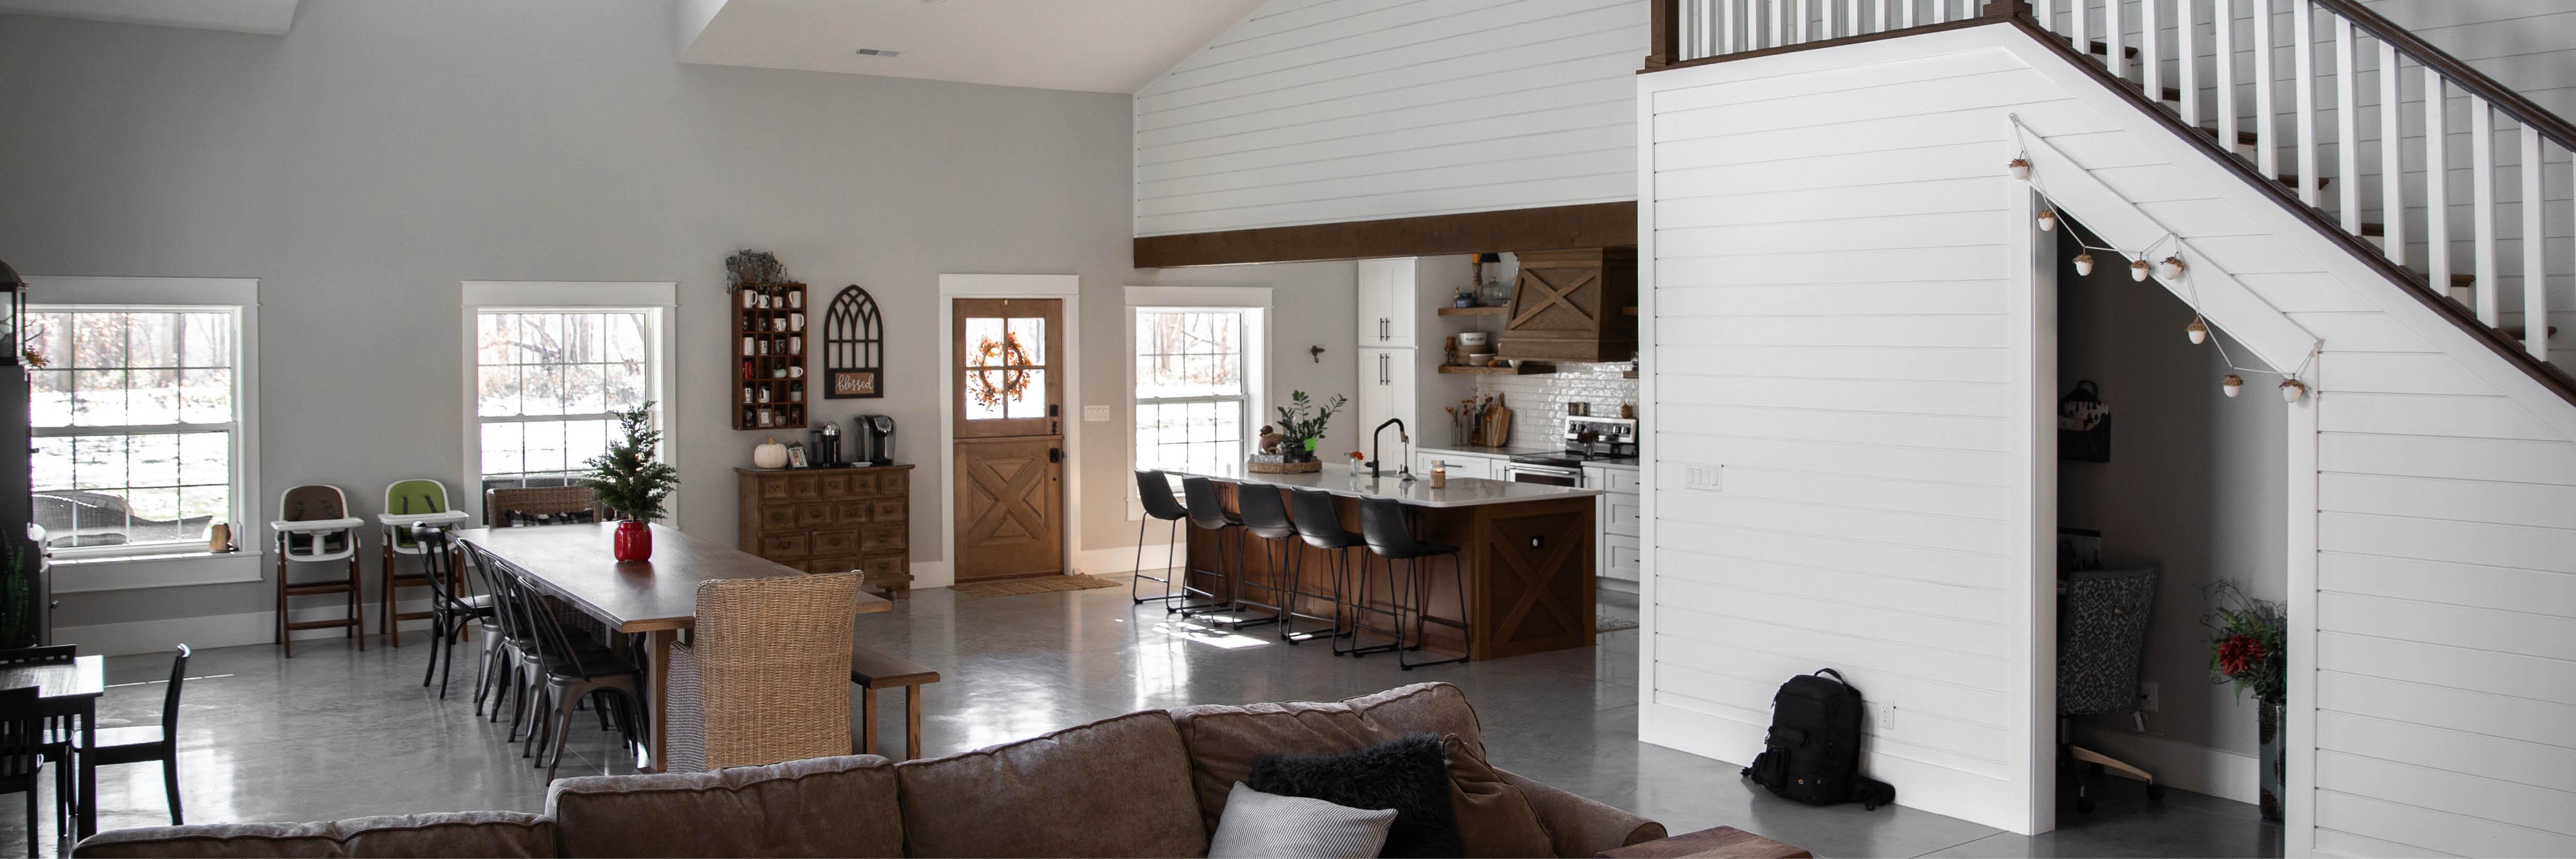 Pole Barn Interior: Can You Install Drywall?